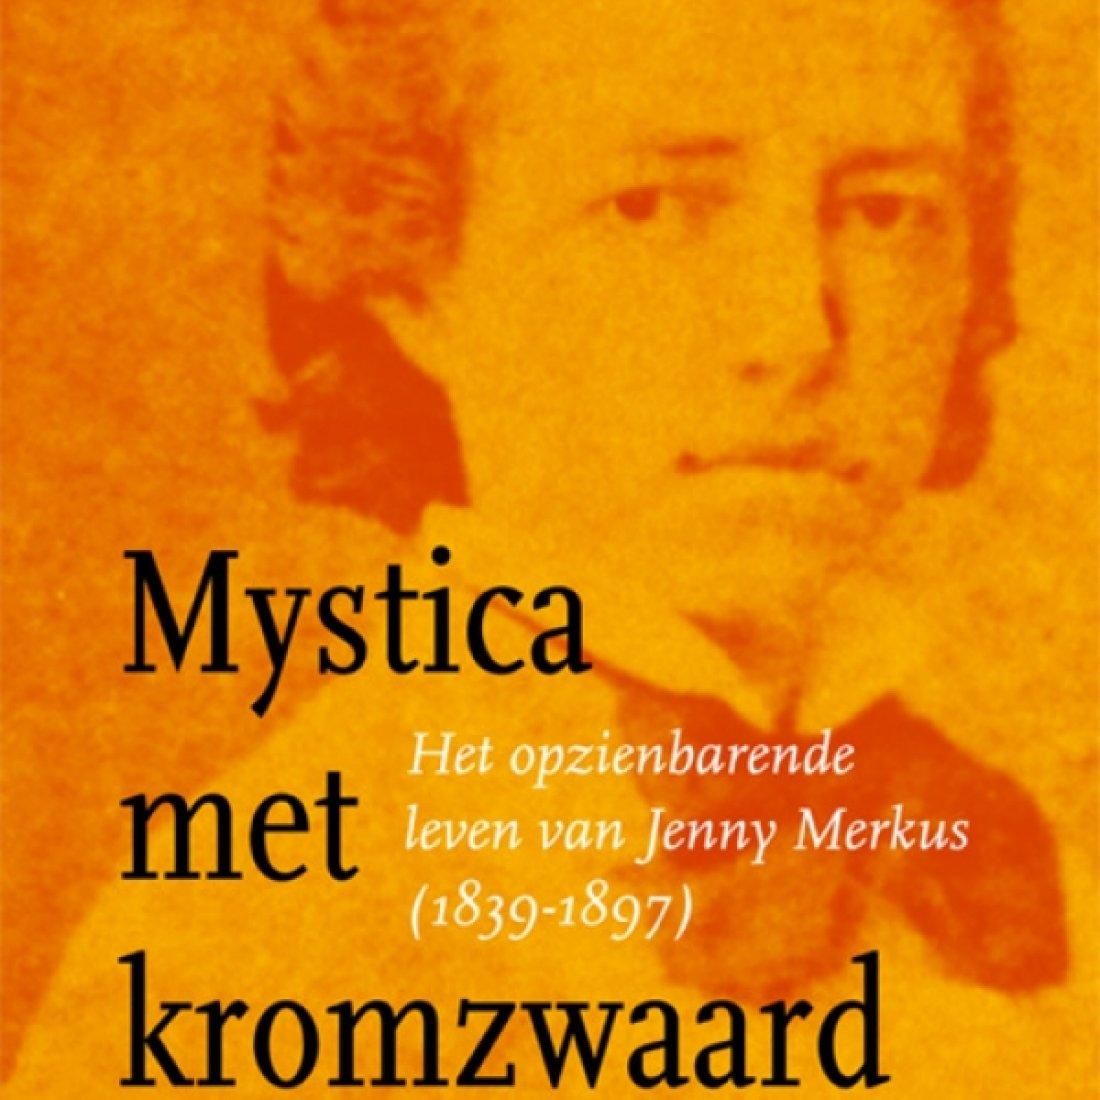 Biografie over Jenny Merkus 2014